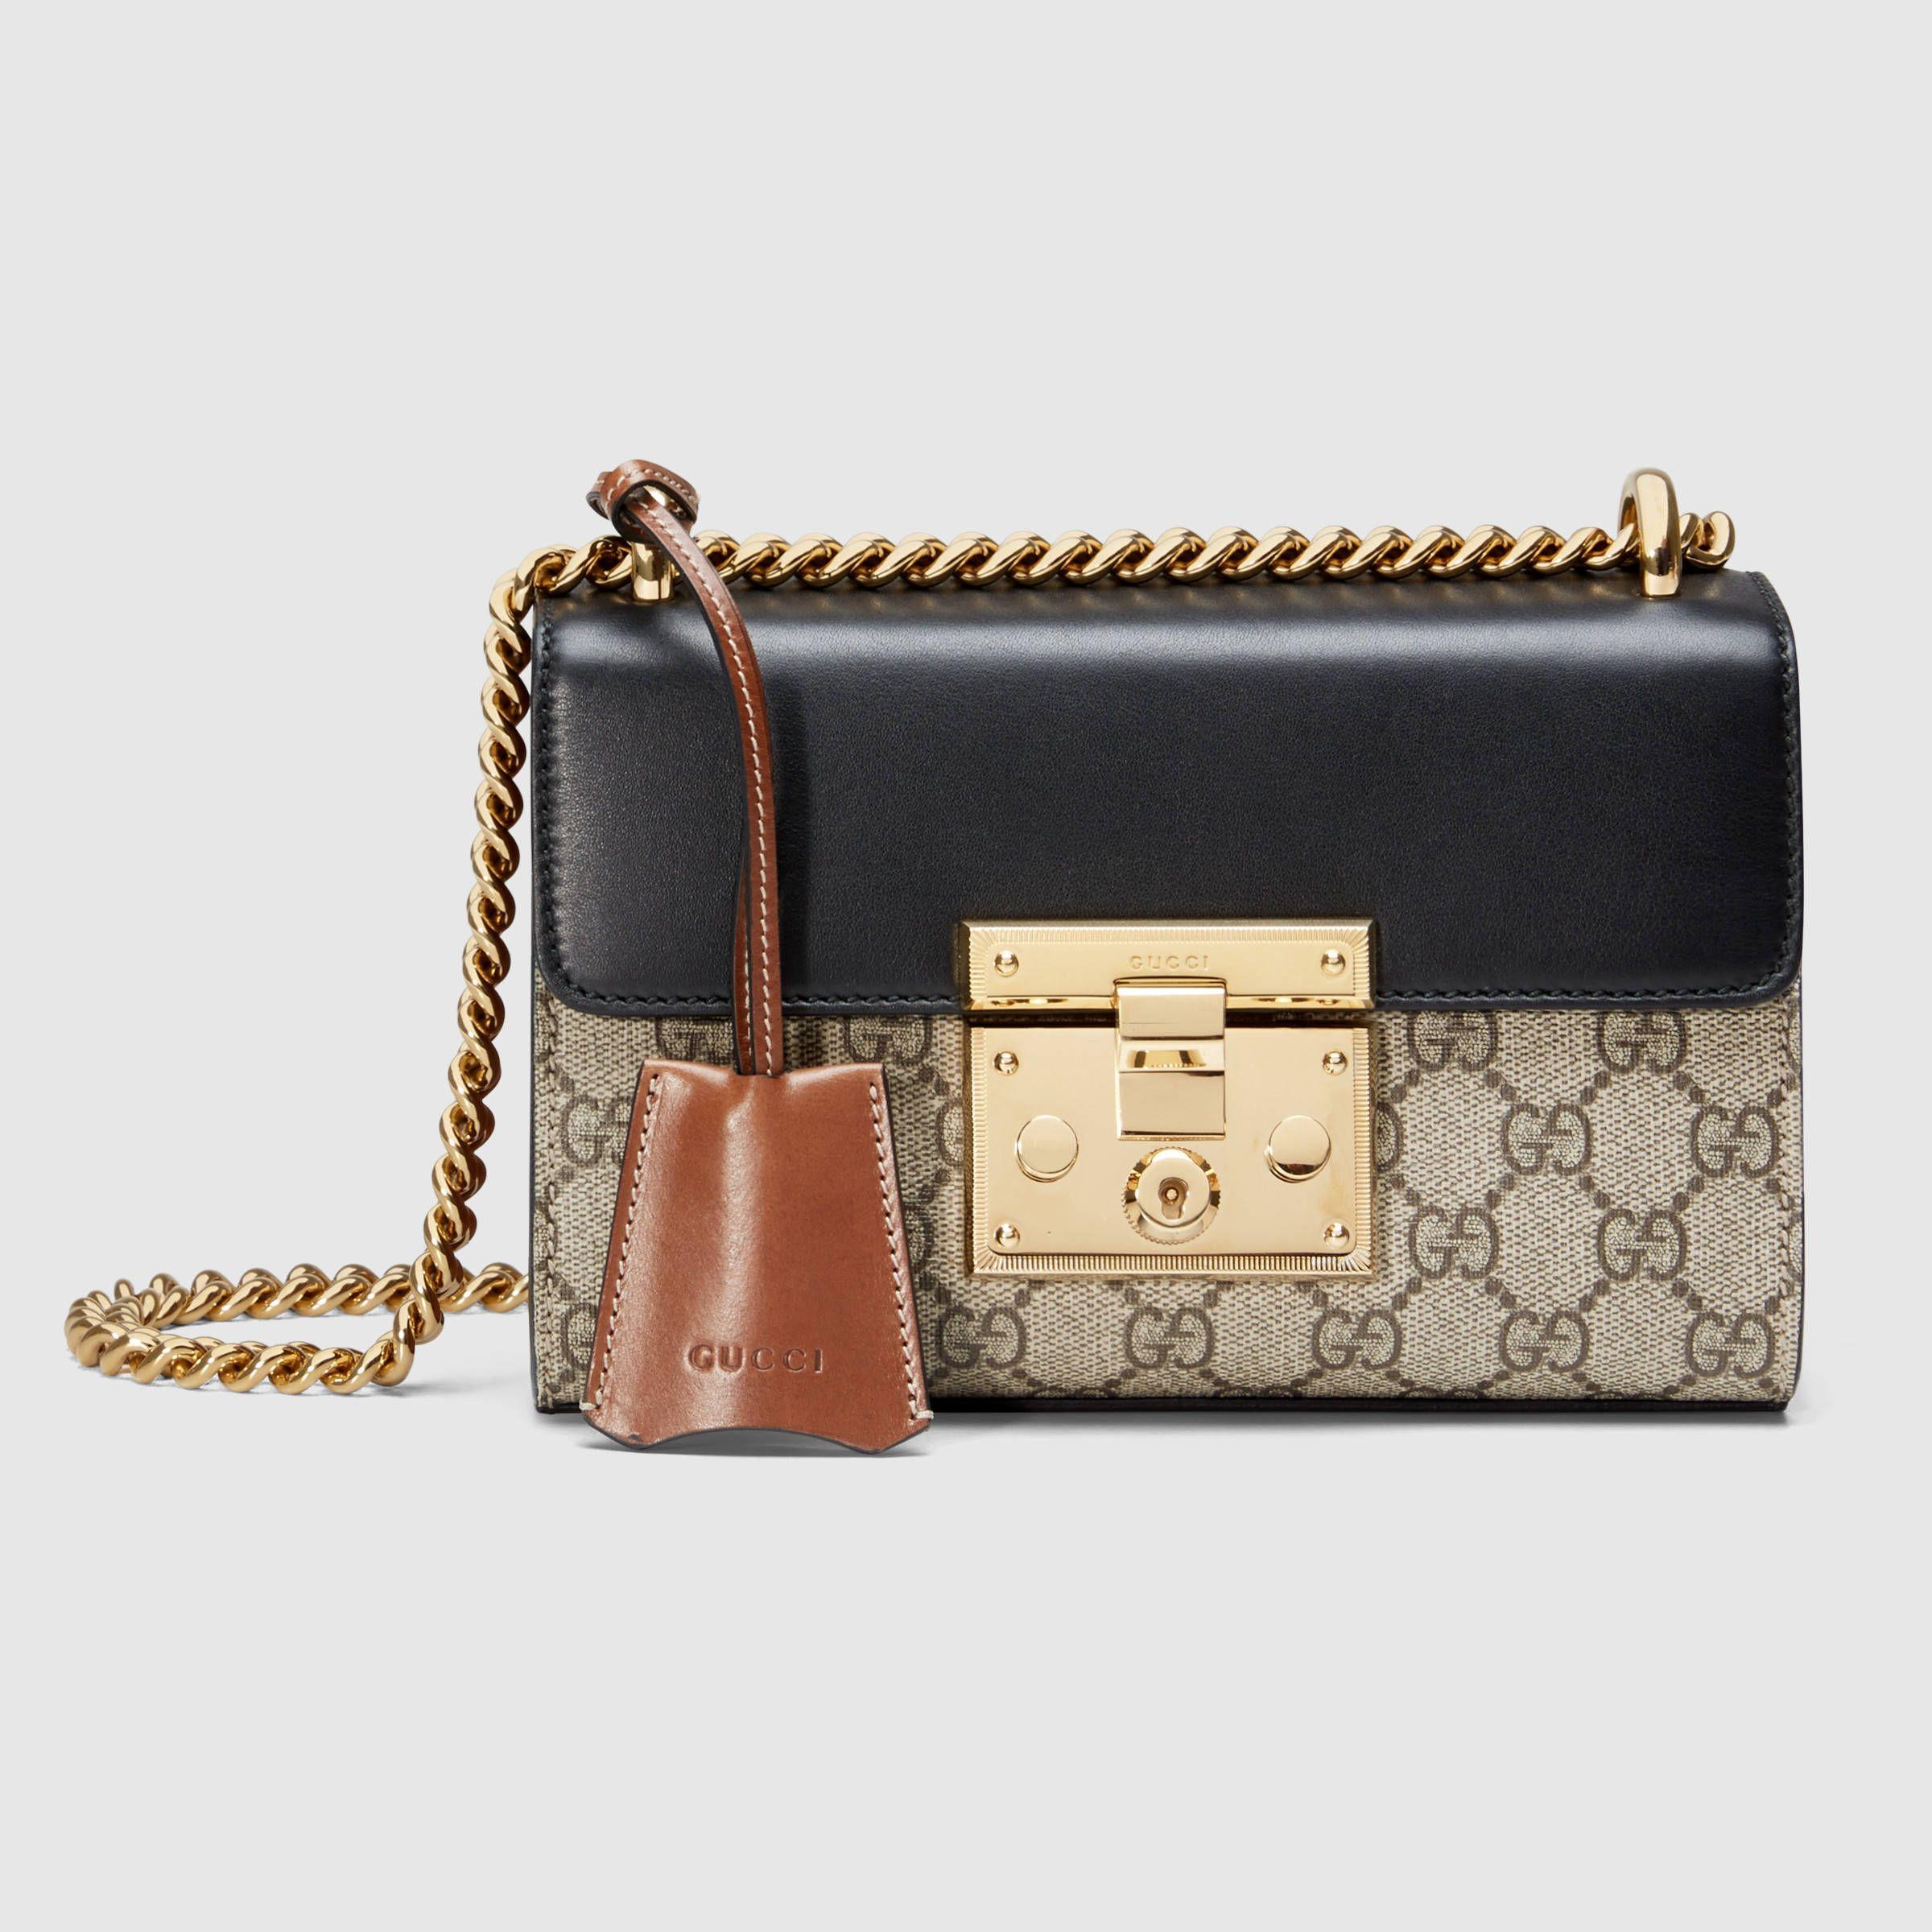 2f82fad0 Padlock small GG shoulder bag | Pocketbooks | Gucci padlock, Gucci ...